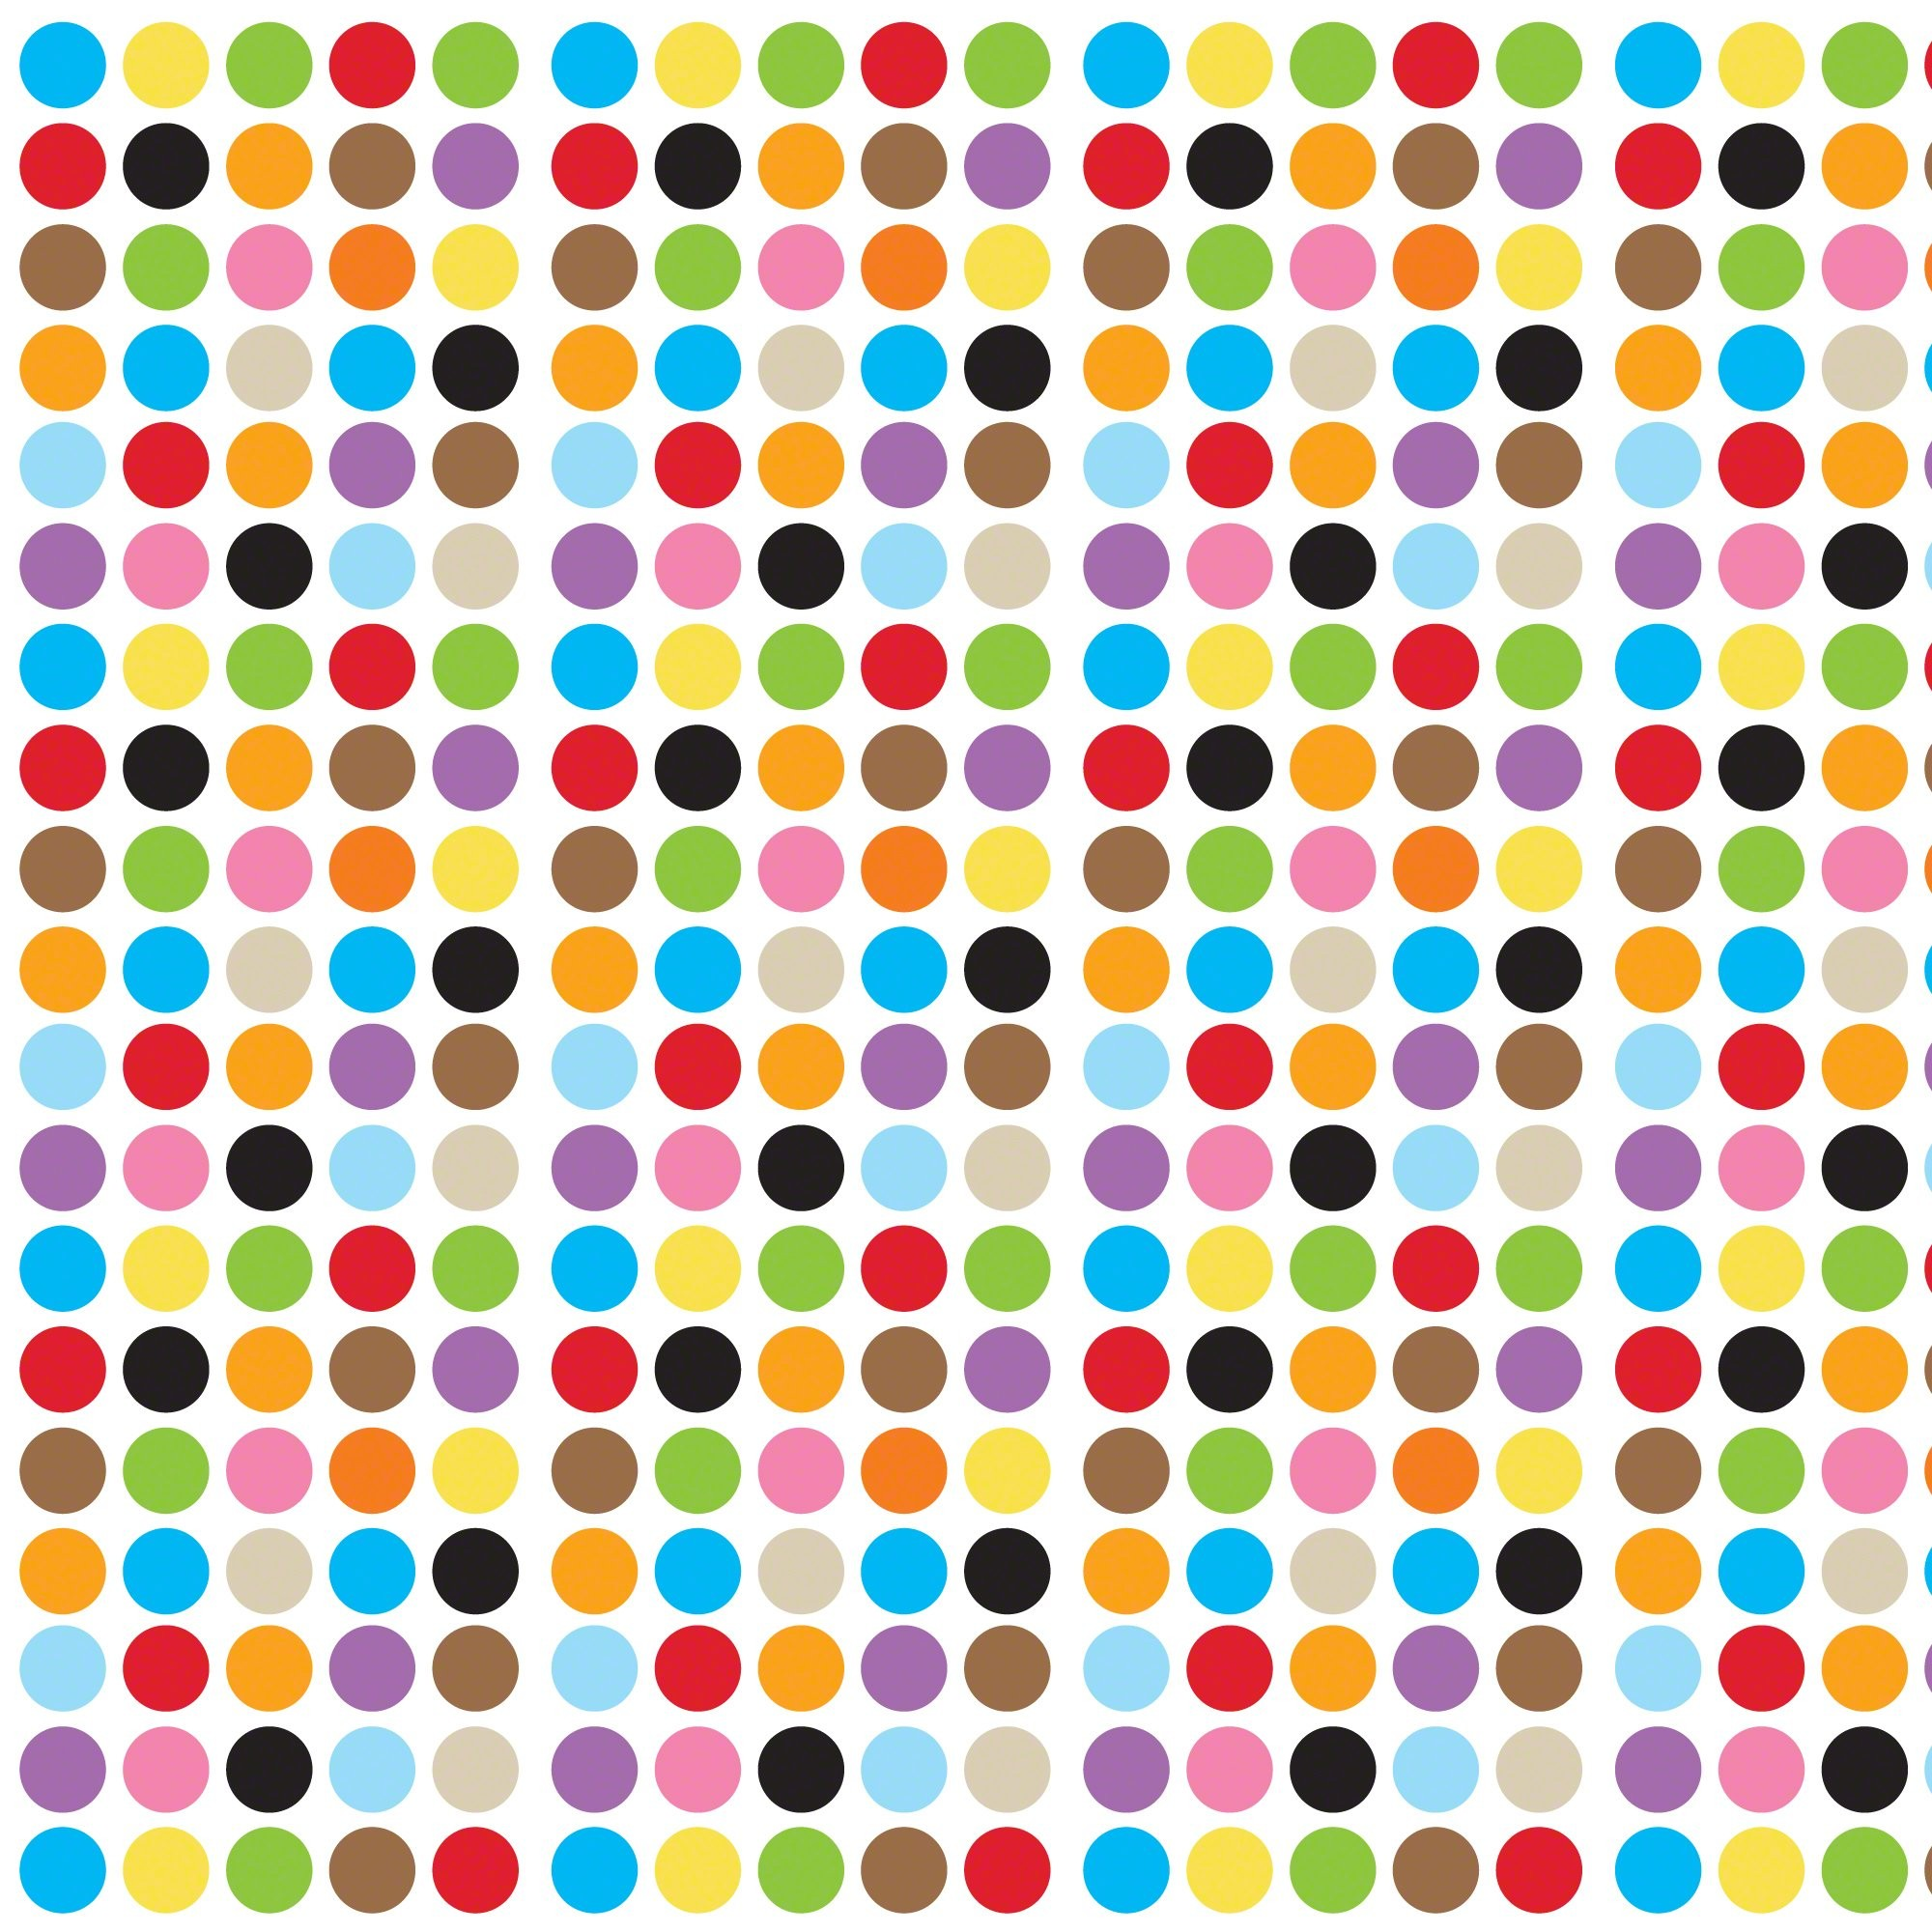 Polka Dot wallpaper ·① Download free cool High Resolution ...